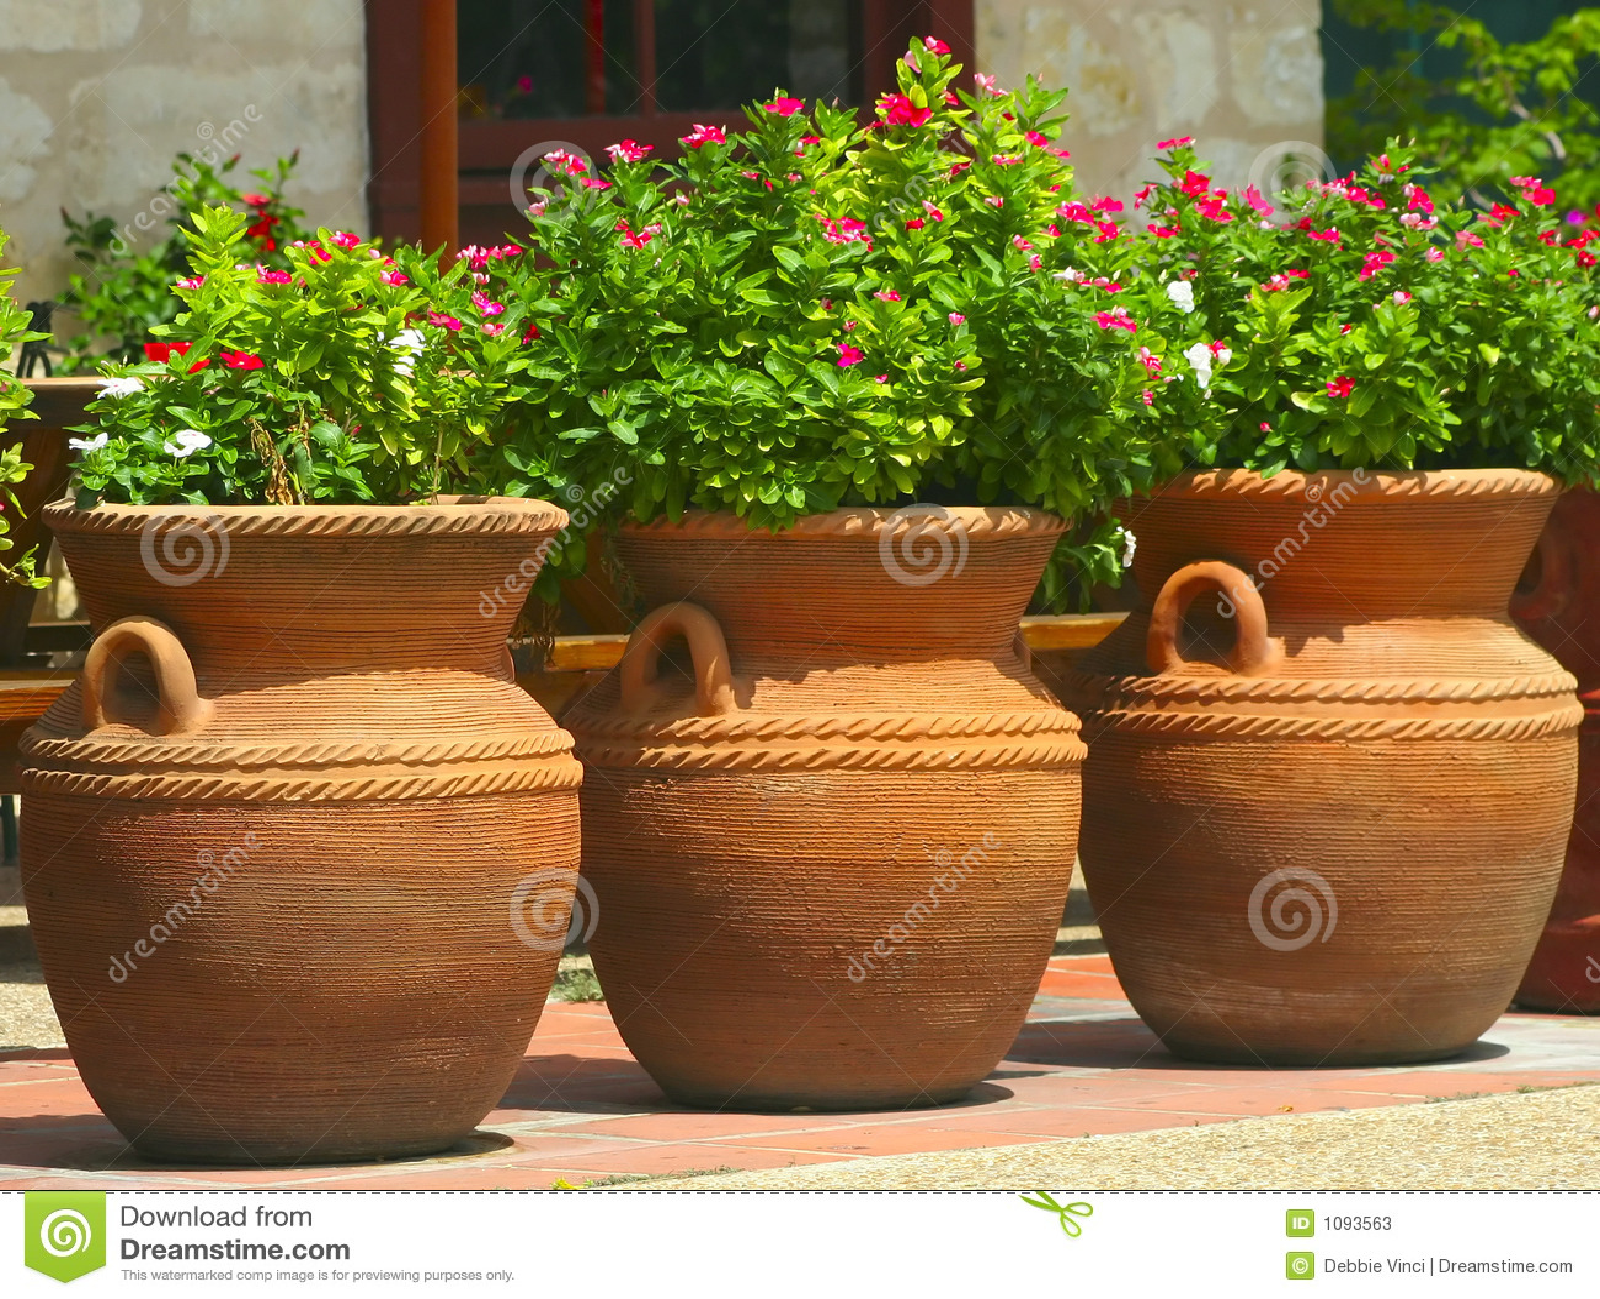 Three Coiled Clay Pots 2 Stock Photos Image 1093563